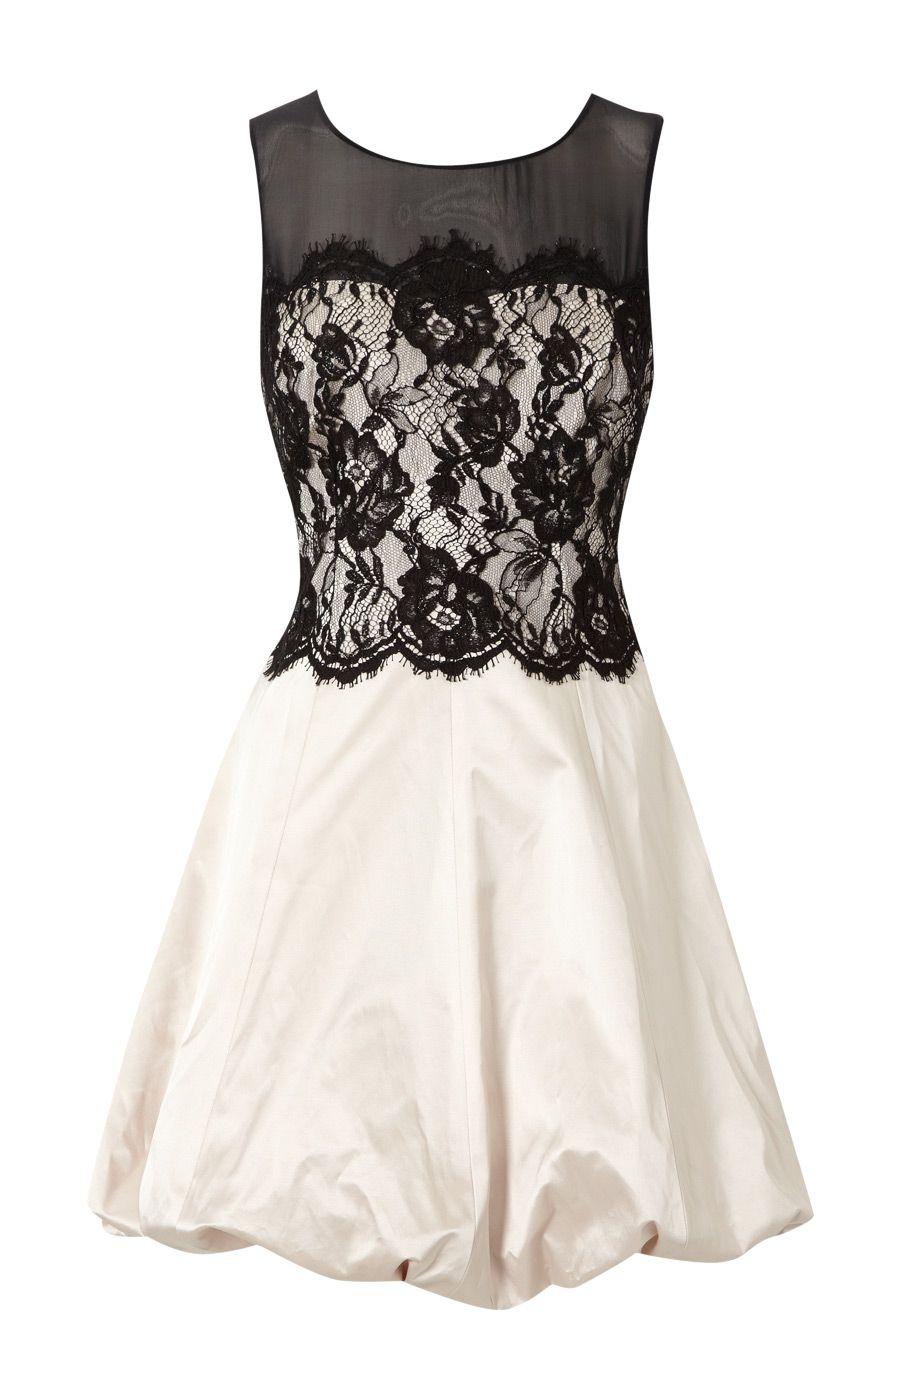 to wear - Bubble white dress video